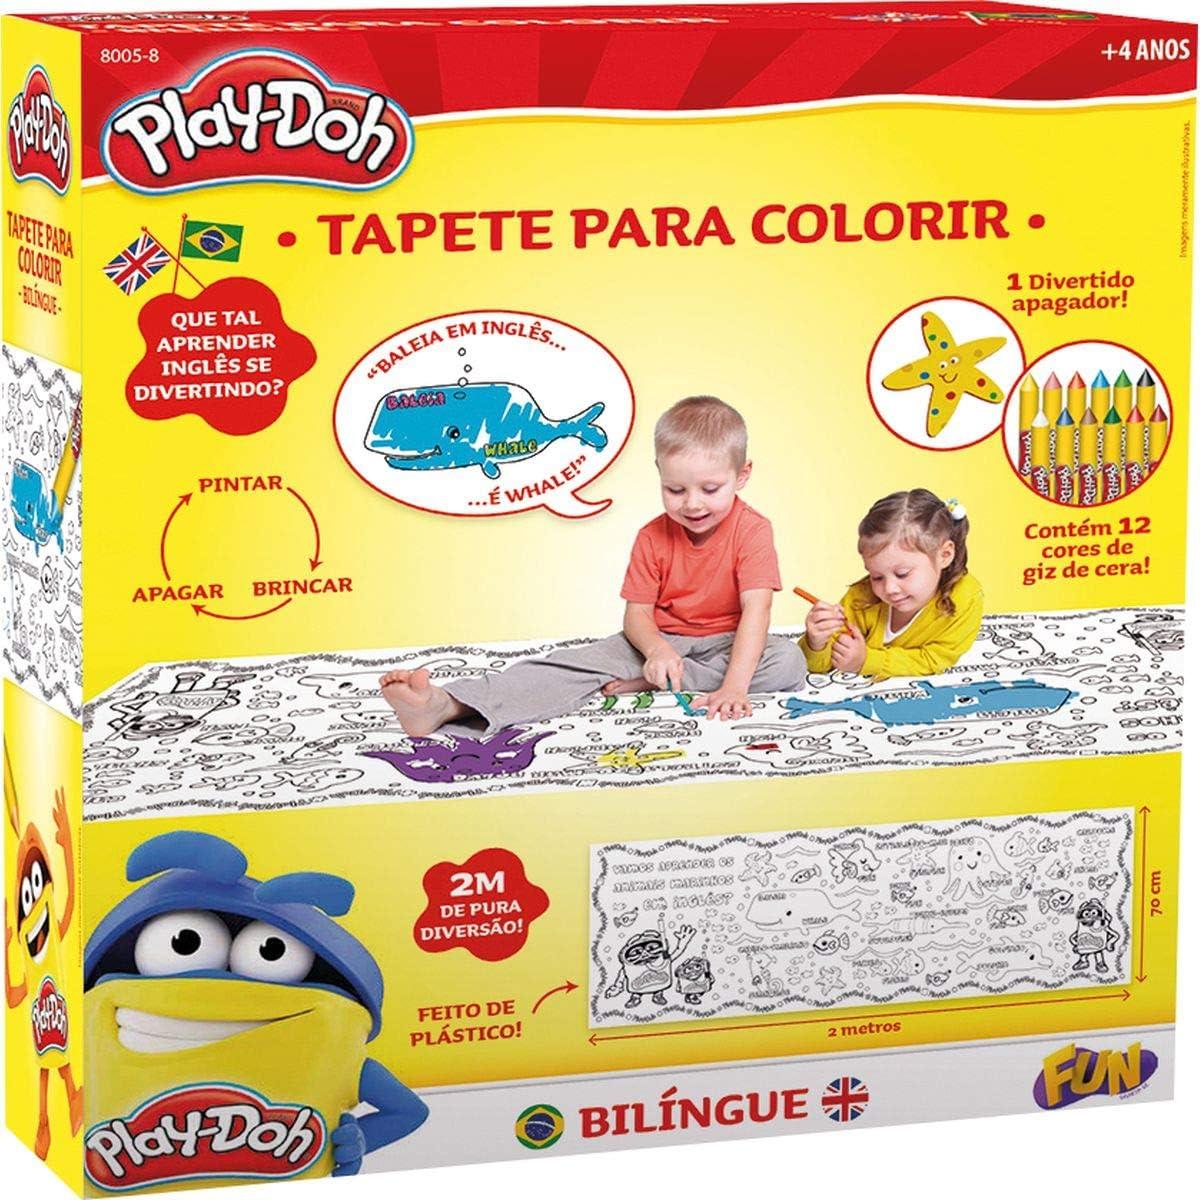 Tapete para Colorir Bilíngue Play Doh